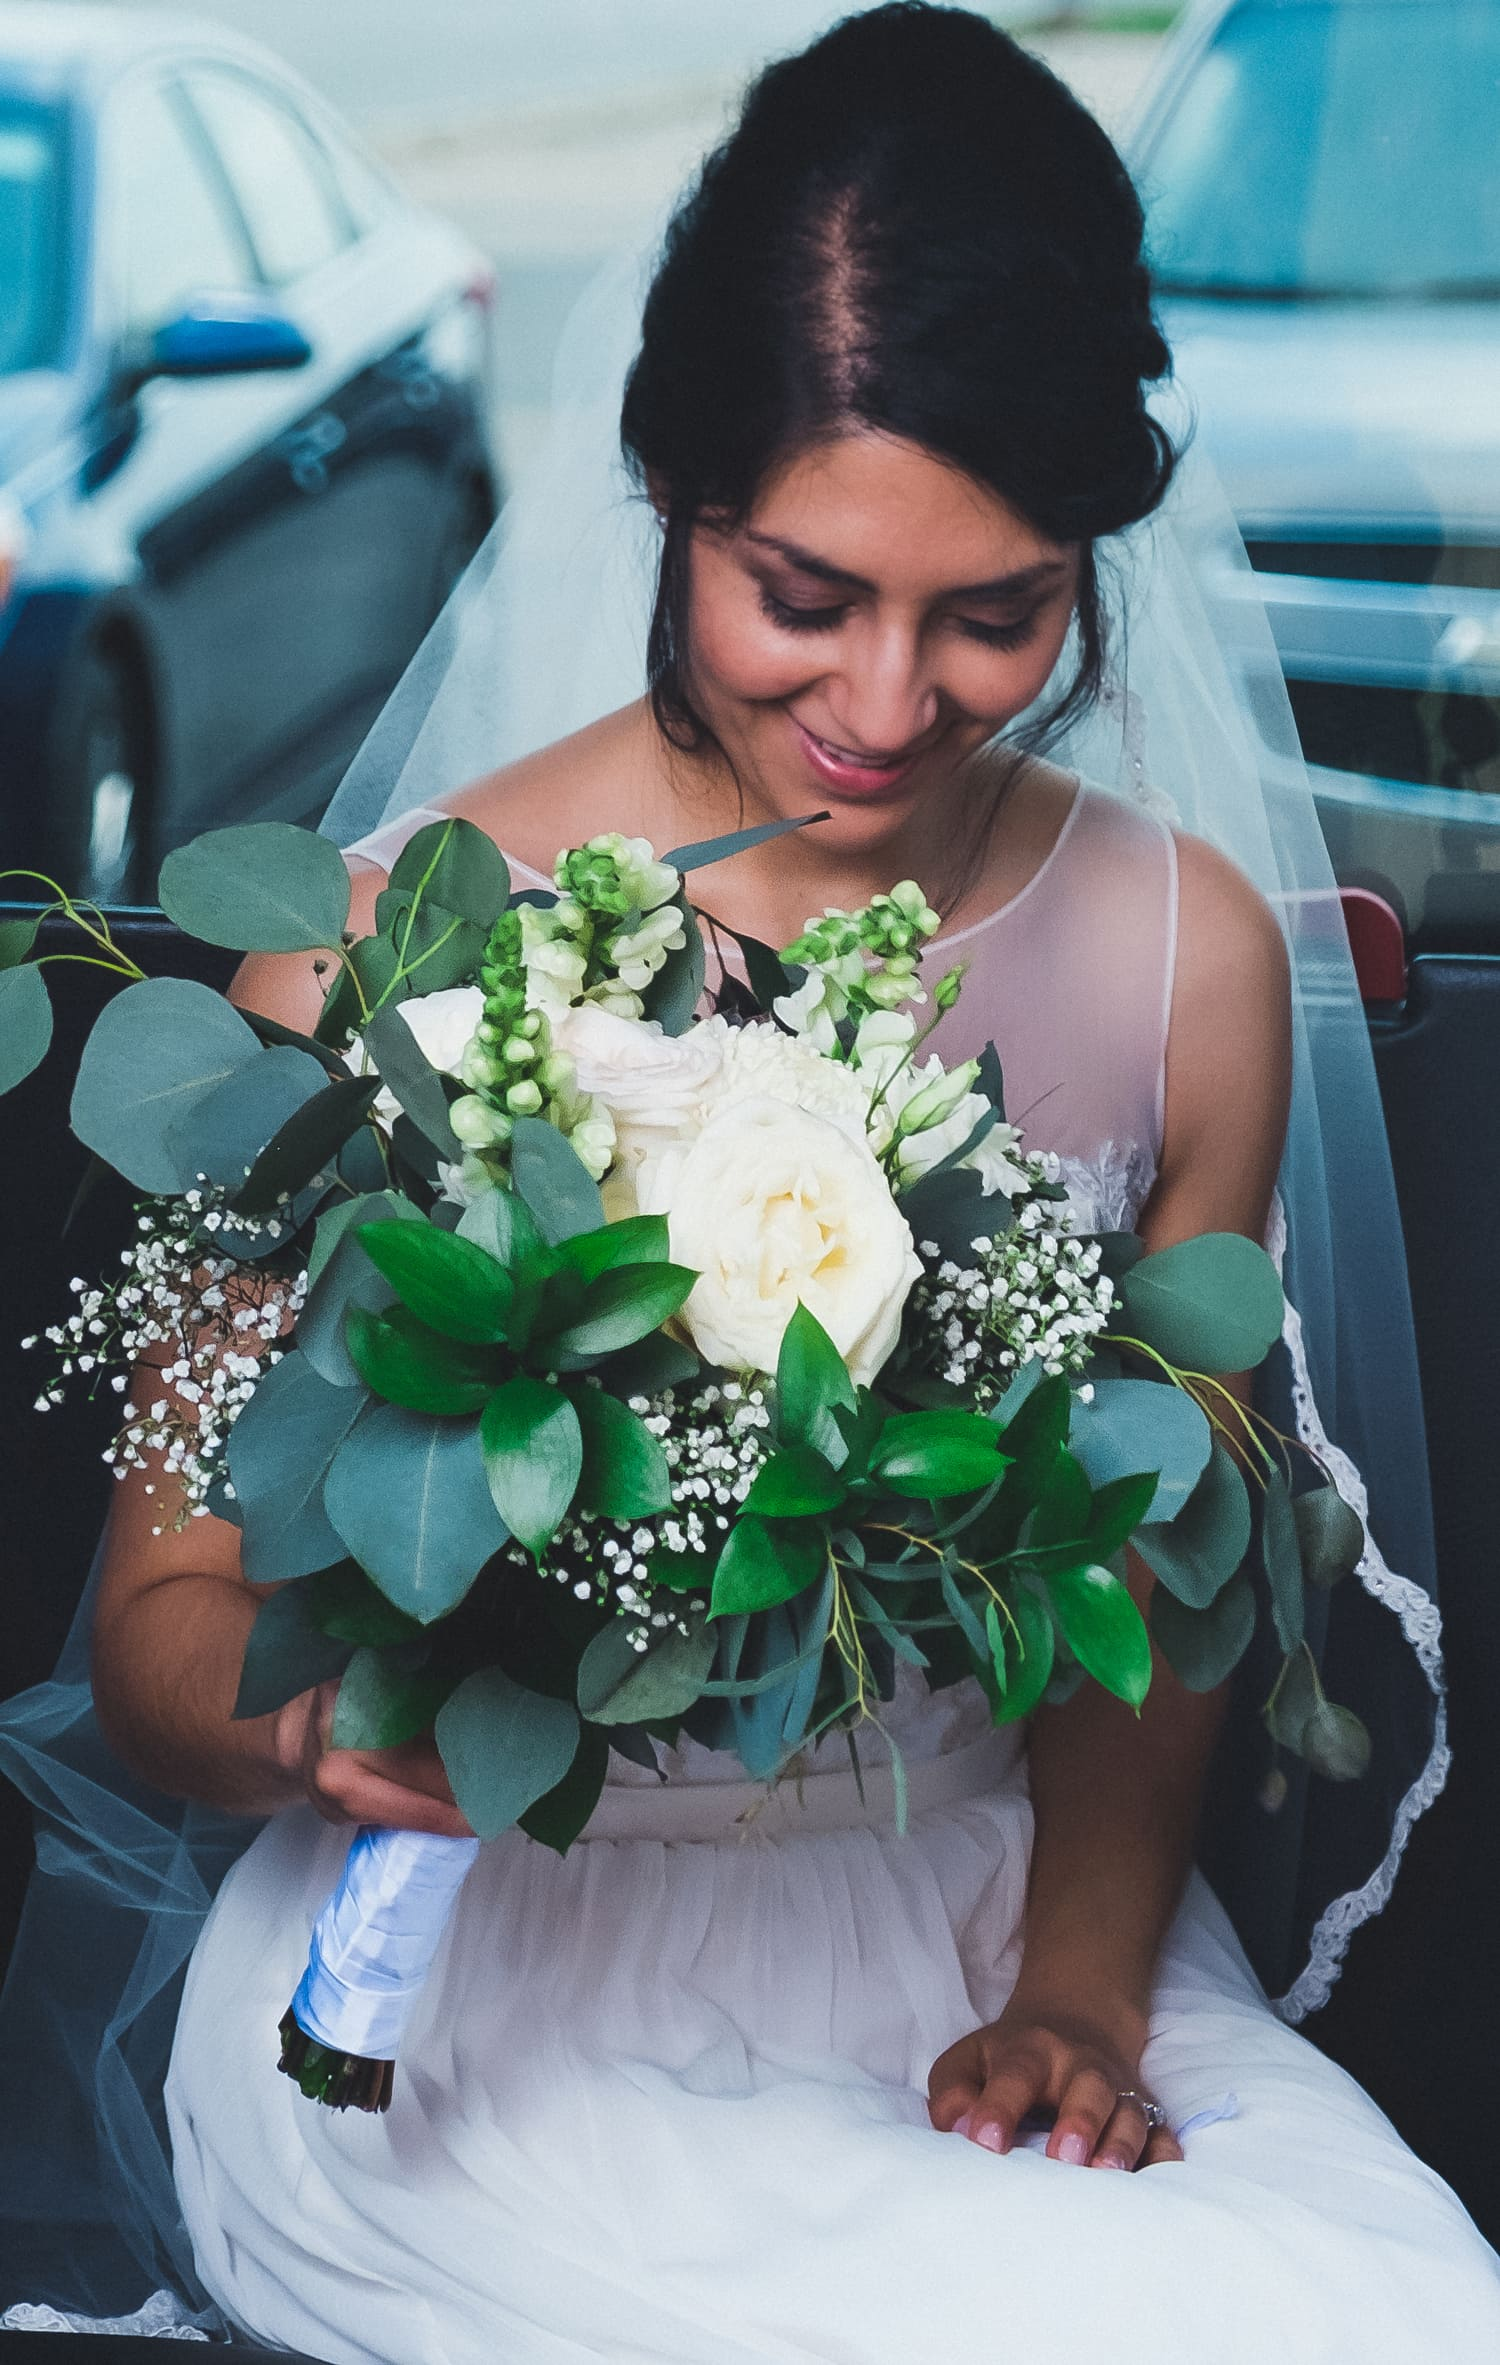 Isabel Orozco Moore holding fiftyflowers.com wedding bouquet. // Photo by Leia Smethurst